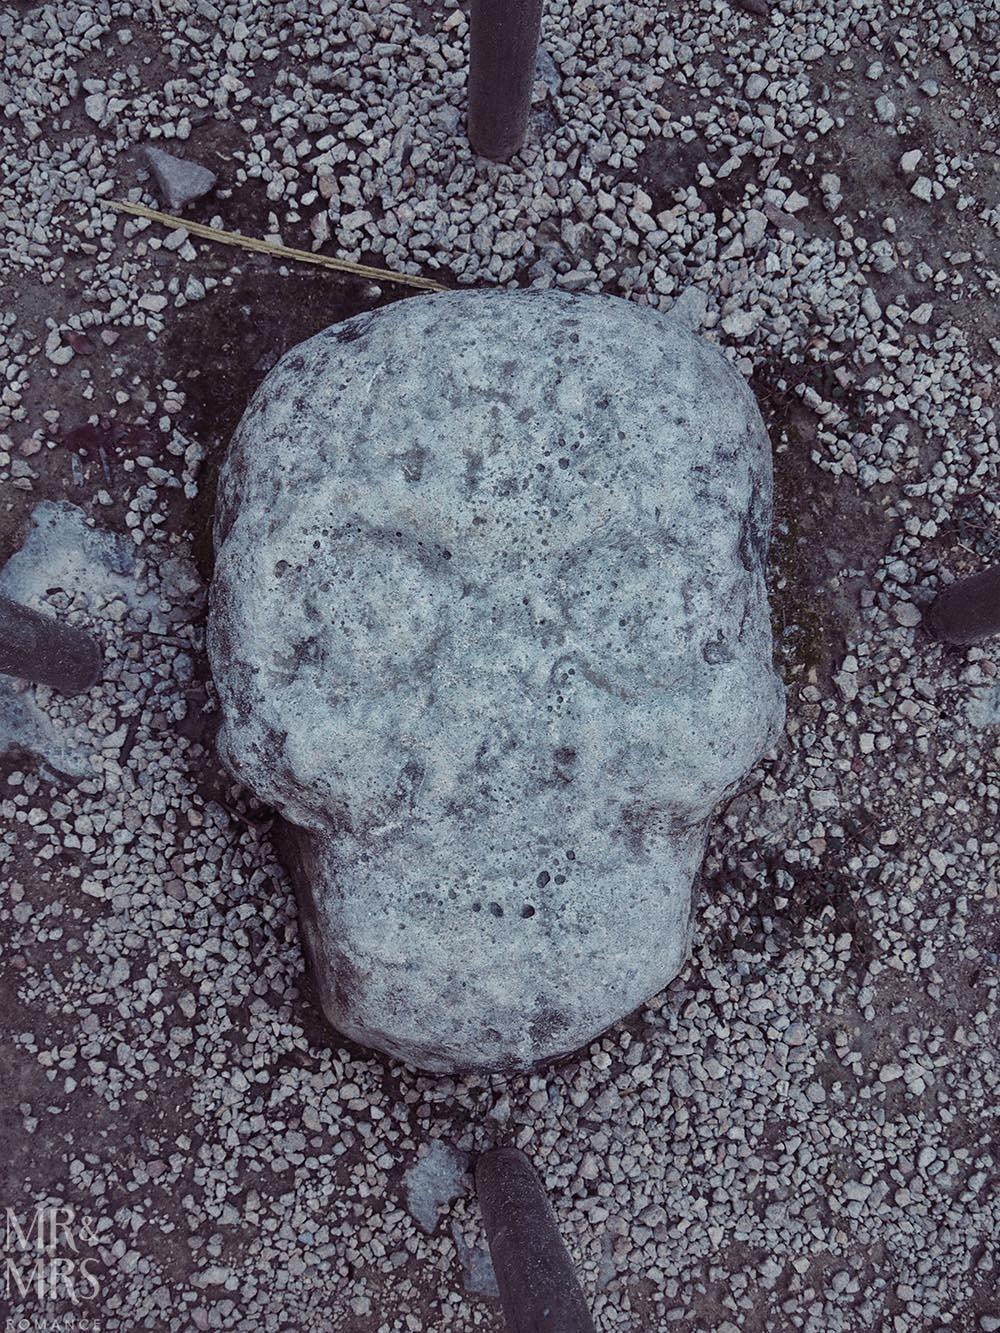 Mayan ruins in Mexico - skull